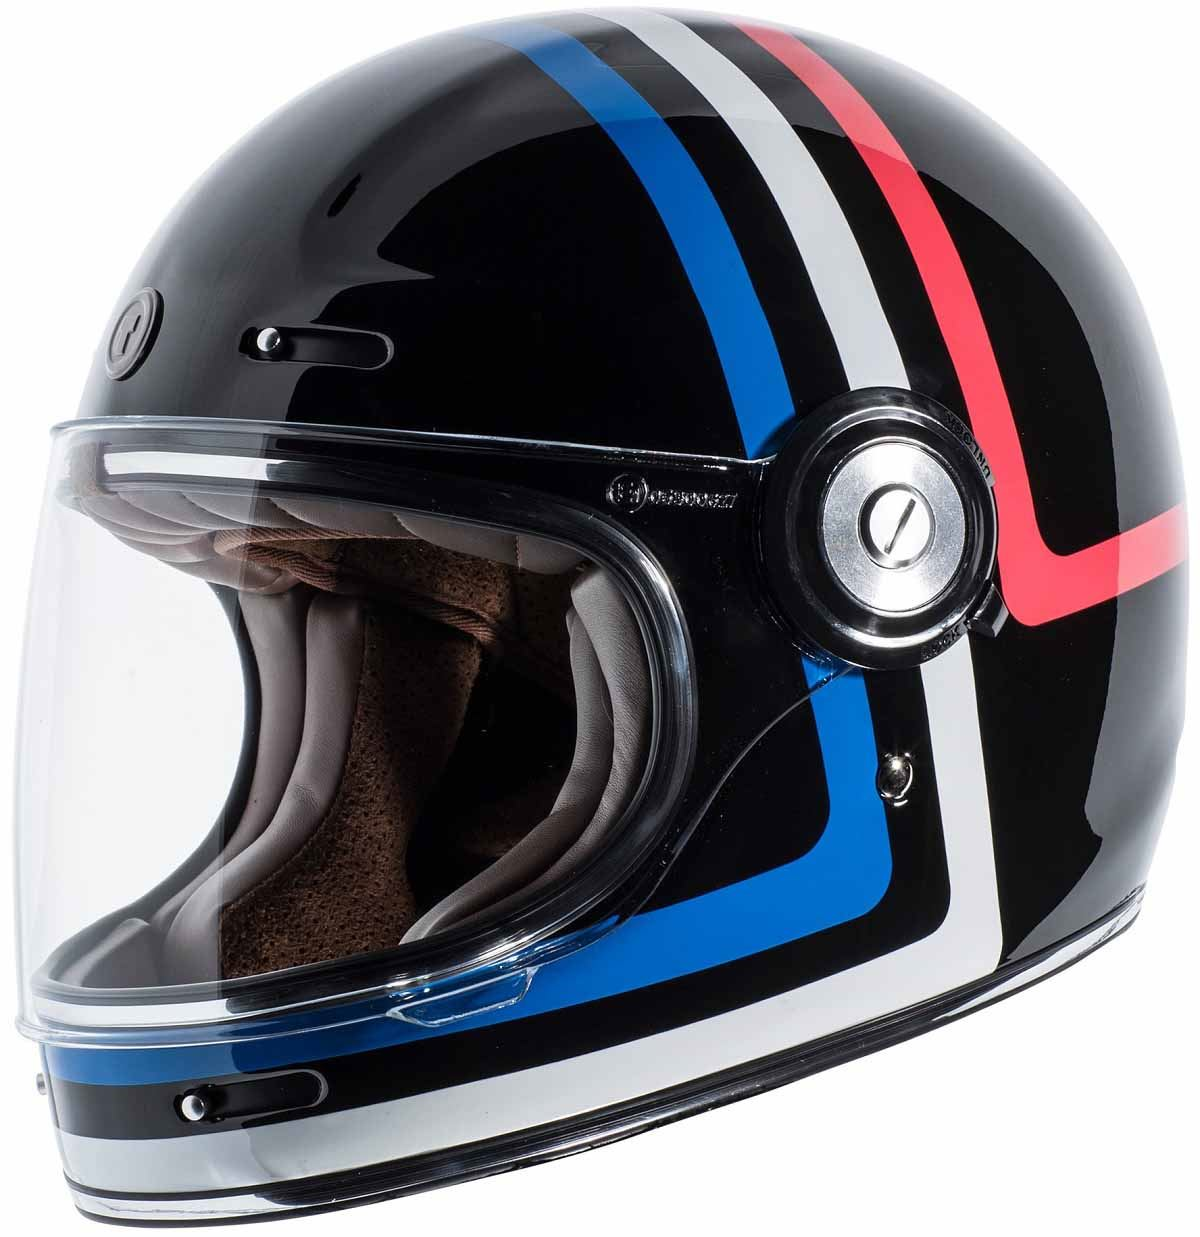 miniature 12 - Torc T1 Helmet Retro Vintage Style Fiberglass DOT Approved XS-2XL